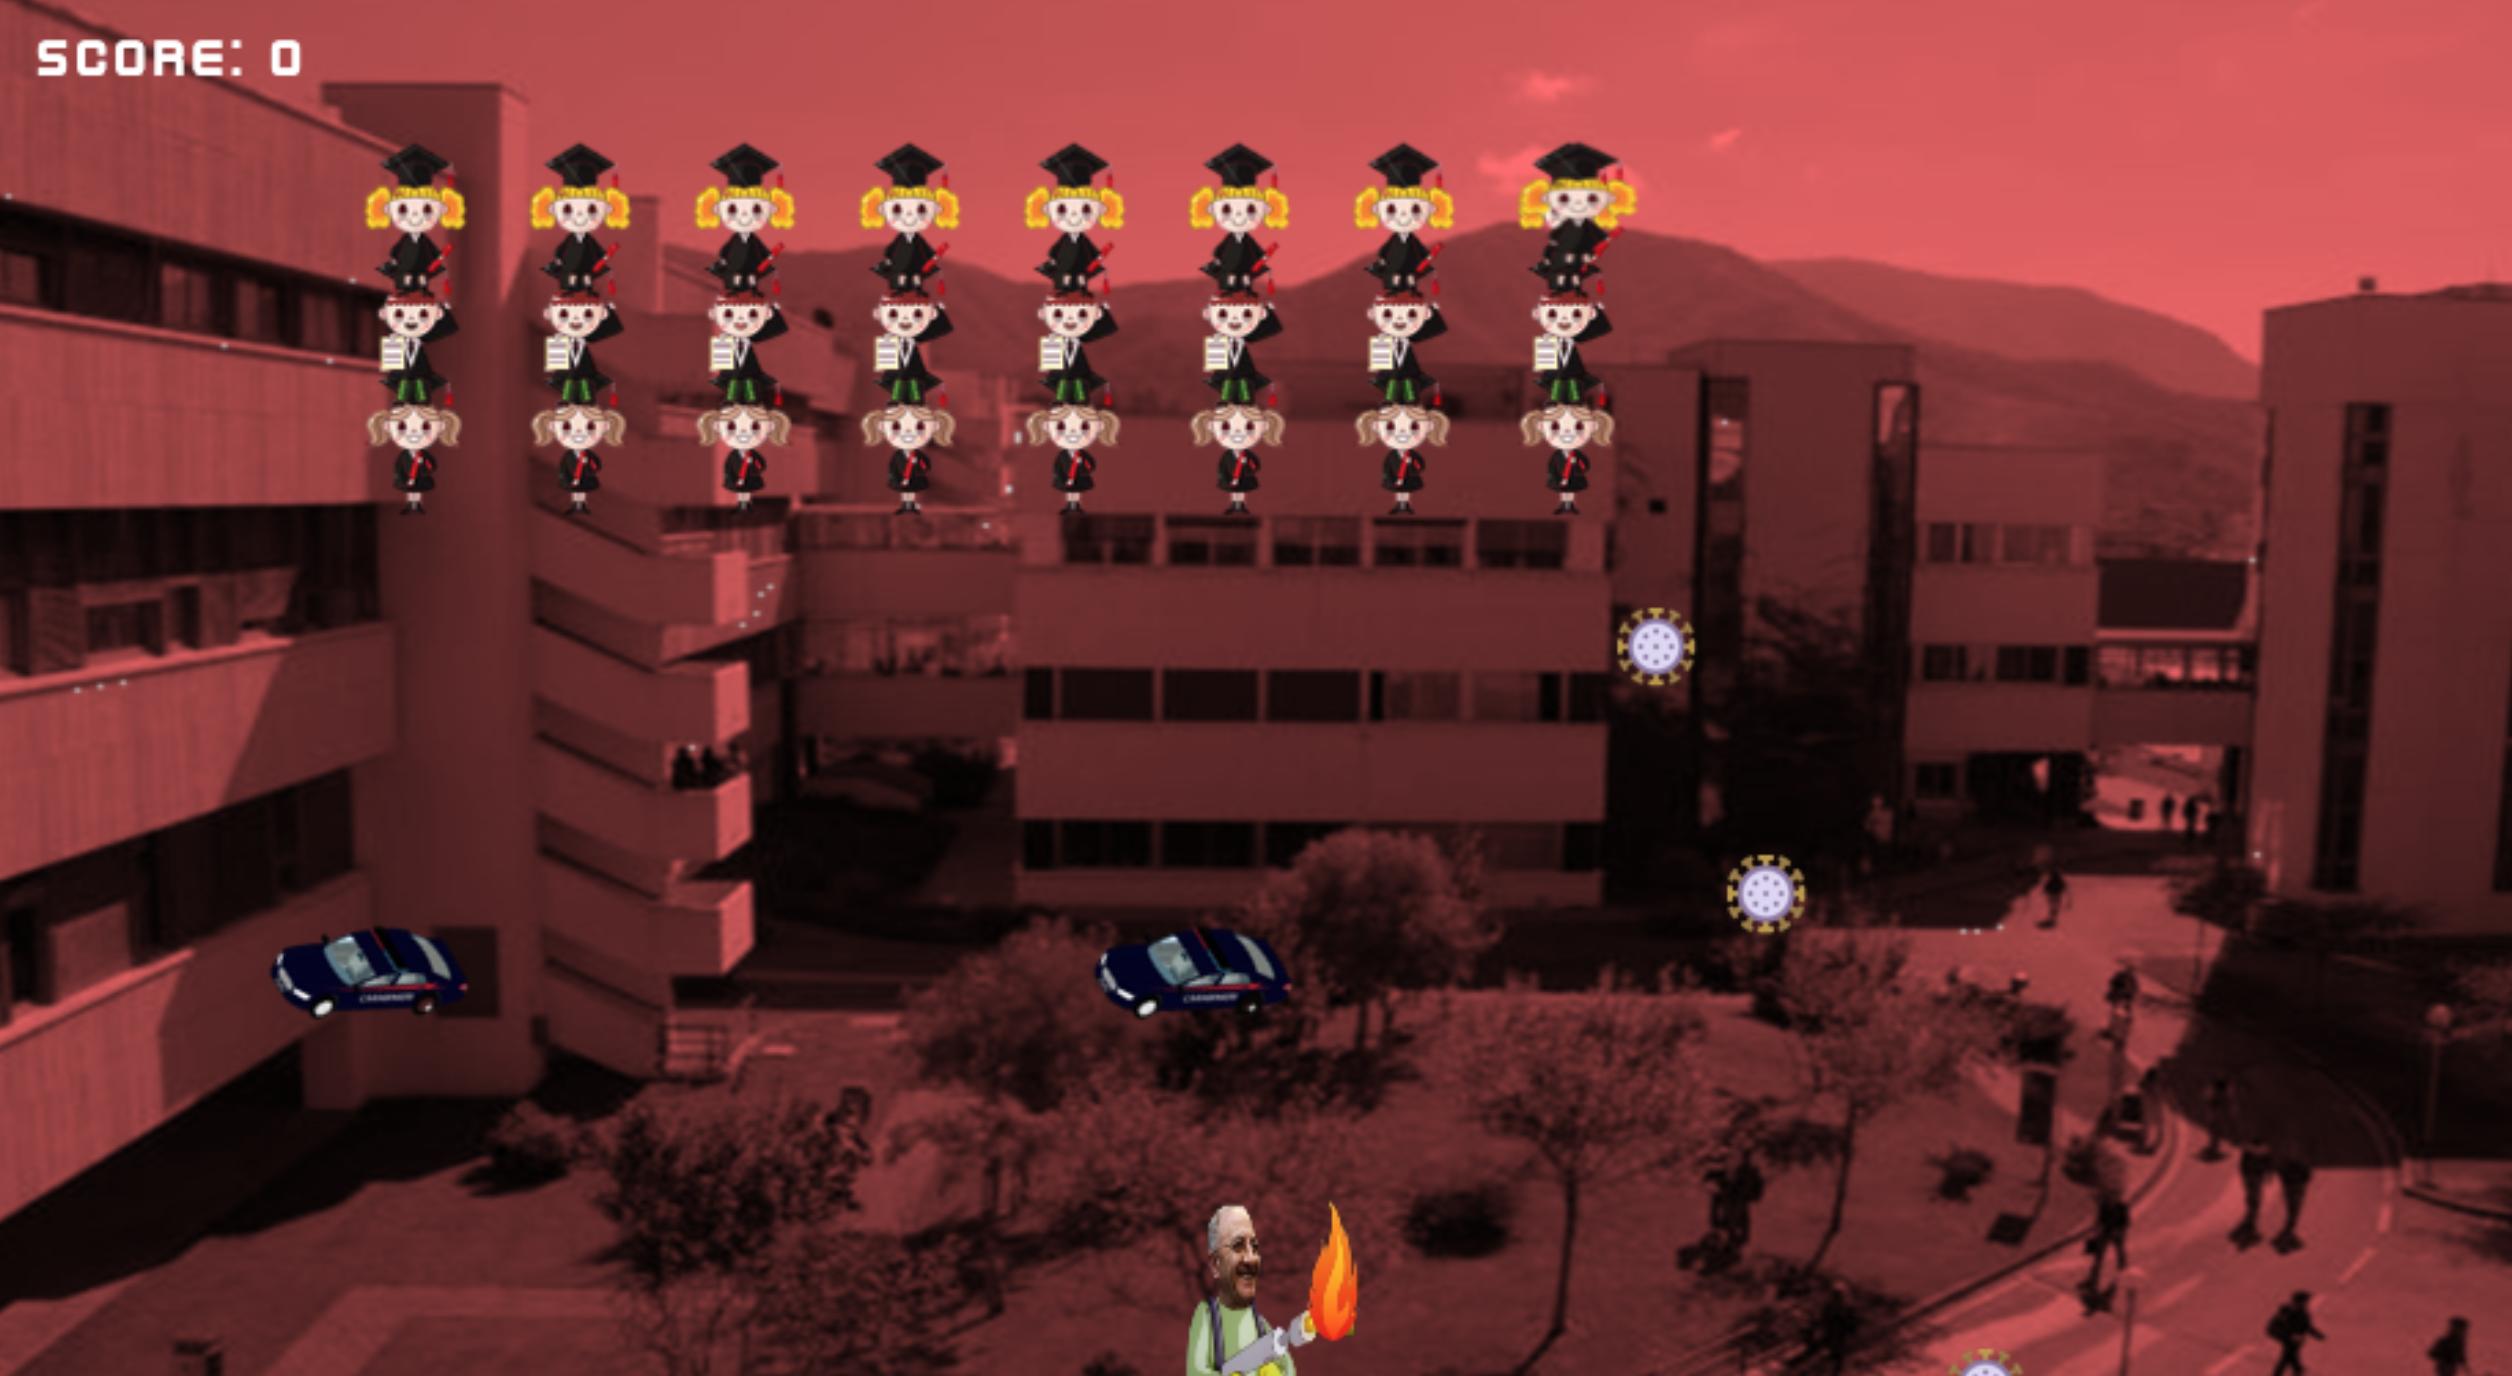 Coronavirus, De Luca diventa un videogioco. Lanciafiamme sui neolaureati